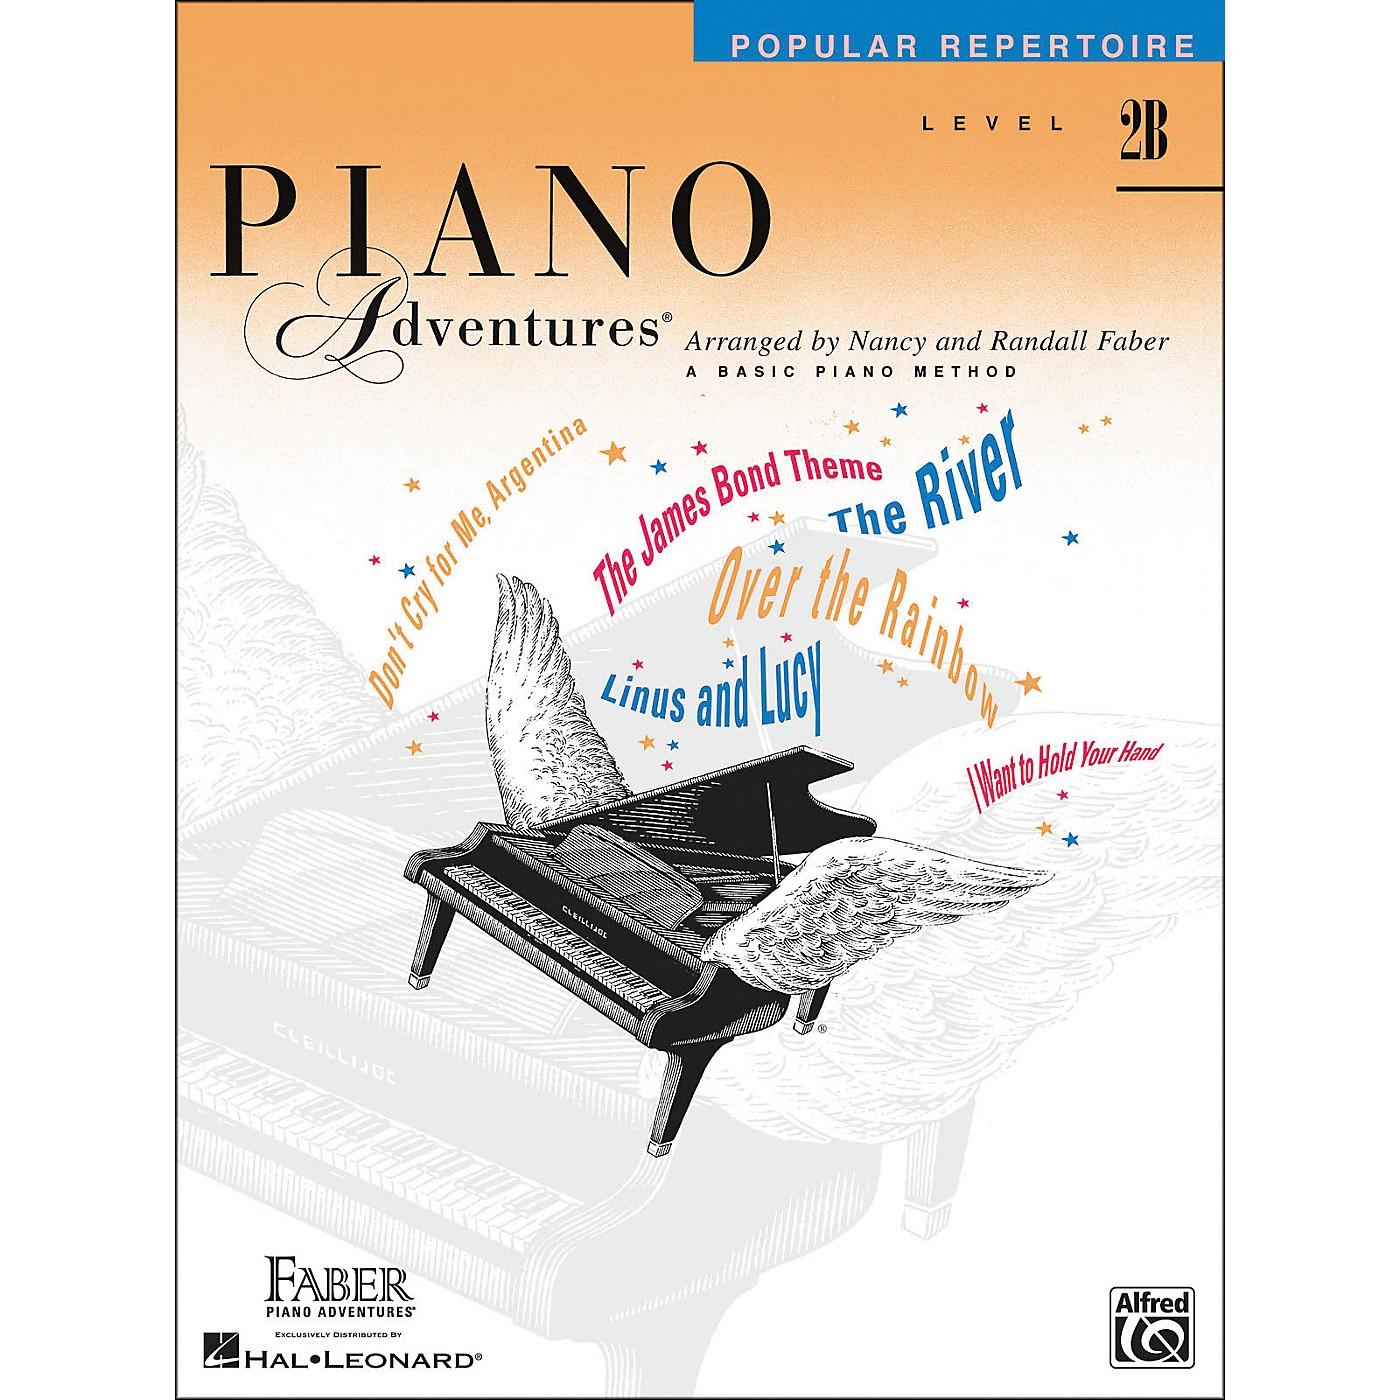 Faber Piano Adventures Piano Adventures - Popular Repertoire Level 2B - Faber Piano thumbnail